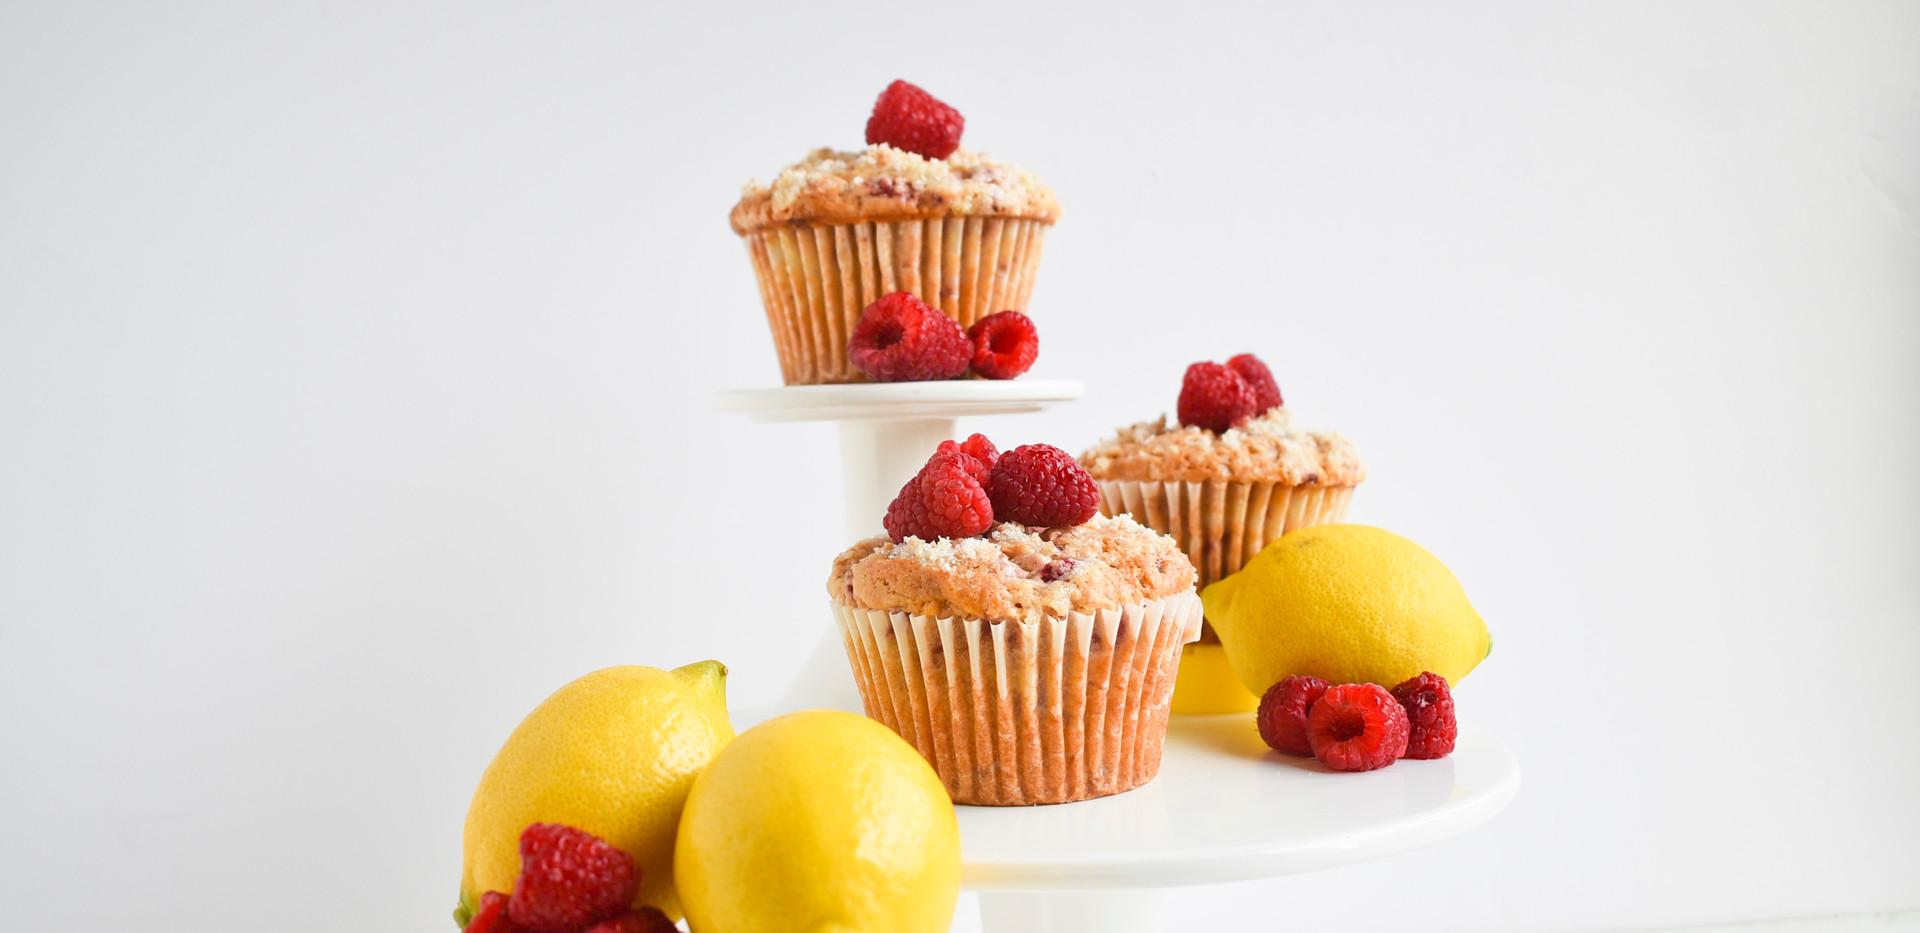 Raspberry Lemon Muffins